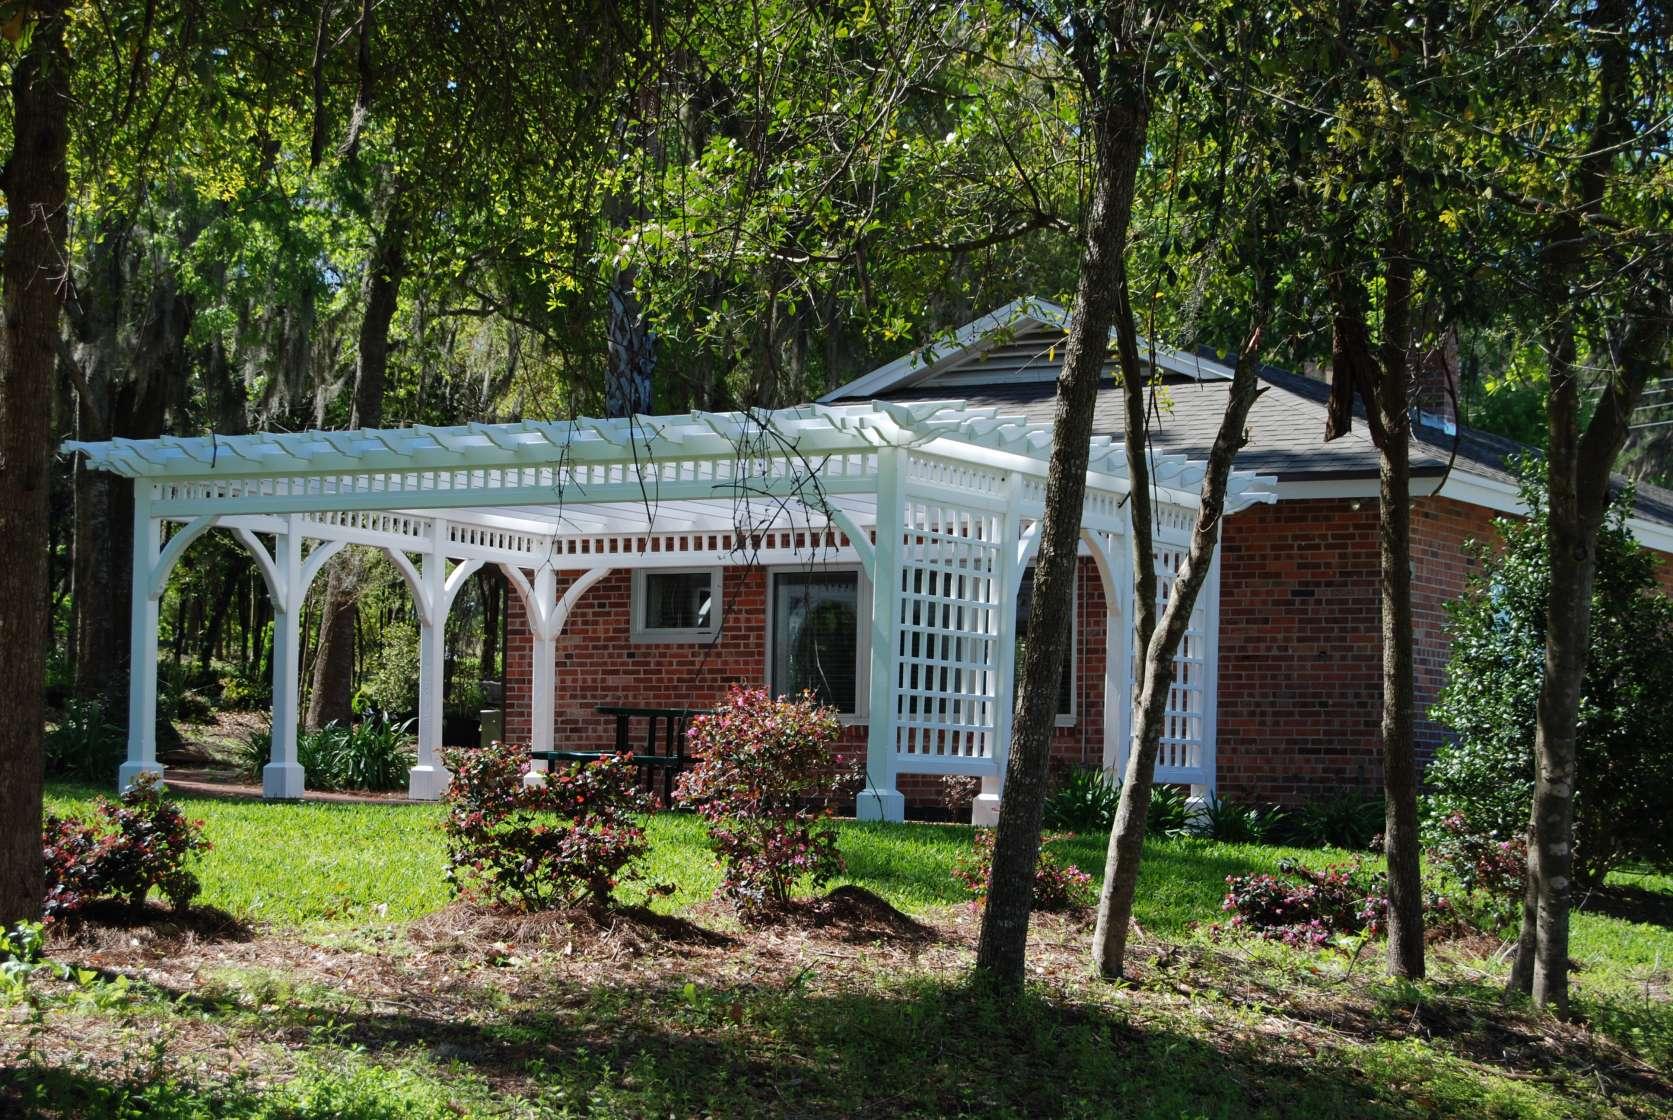 Wiltmot Gardens